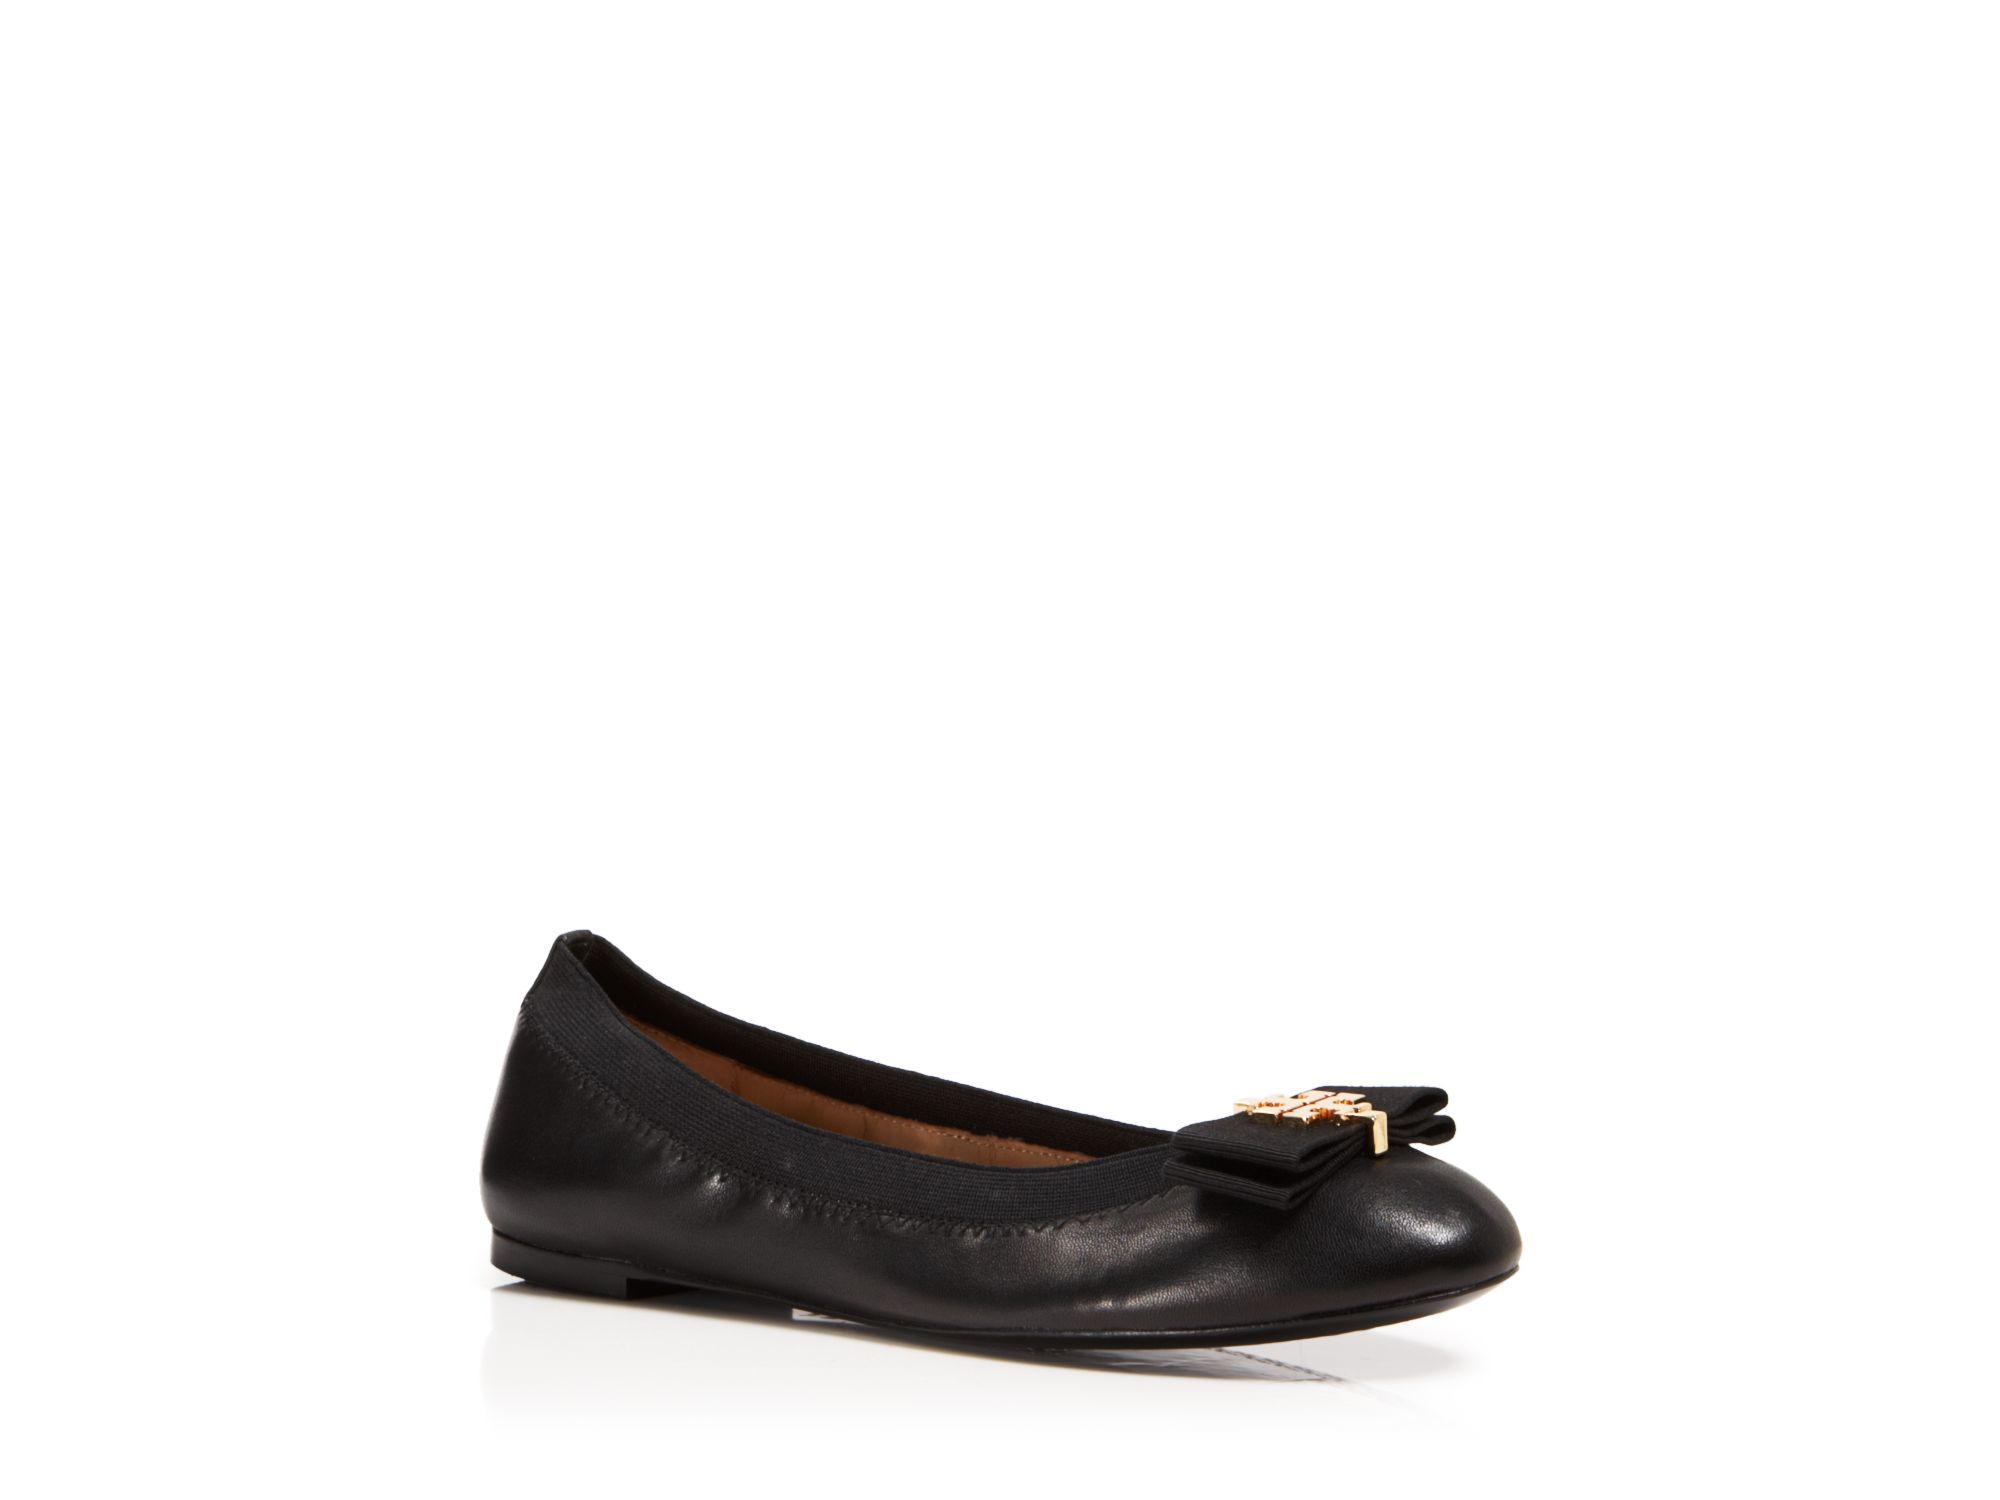 92a1430253860e Lyst - Tory Burch Ballet Flats - Sedgewick Grosgrain Bow in Black